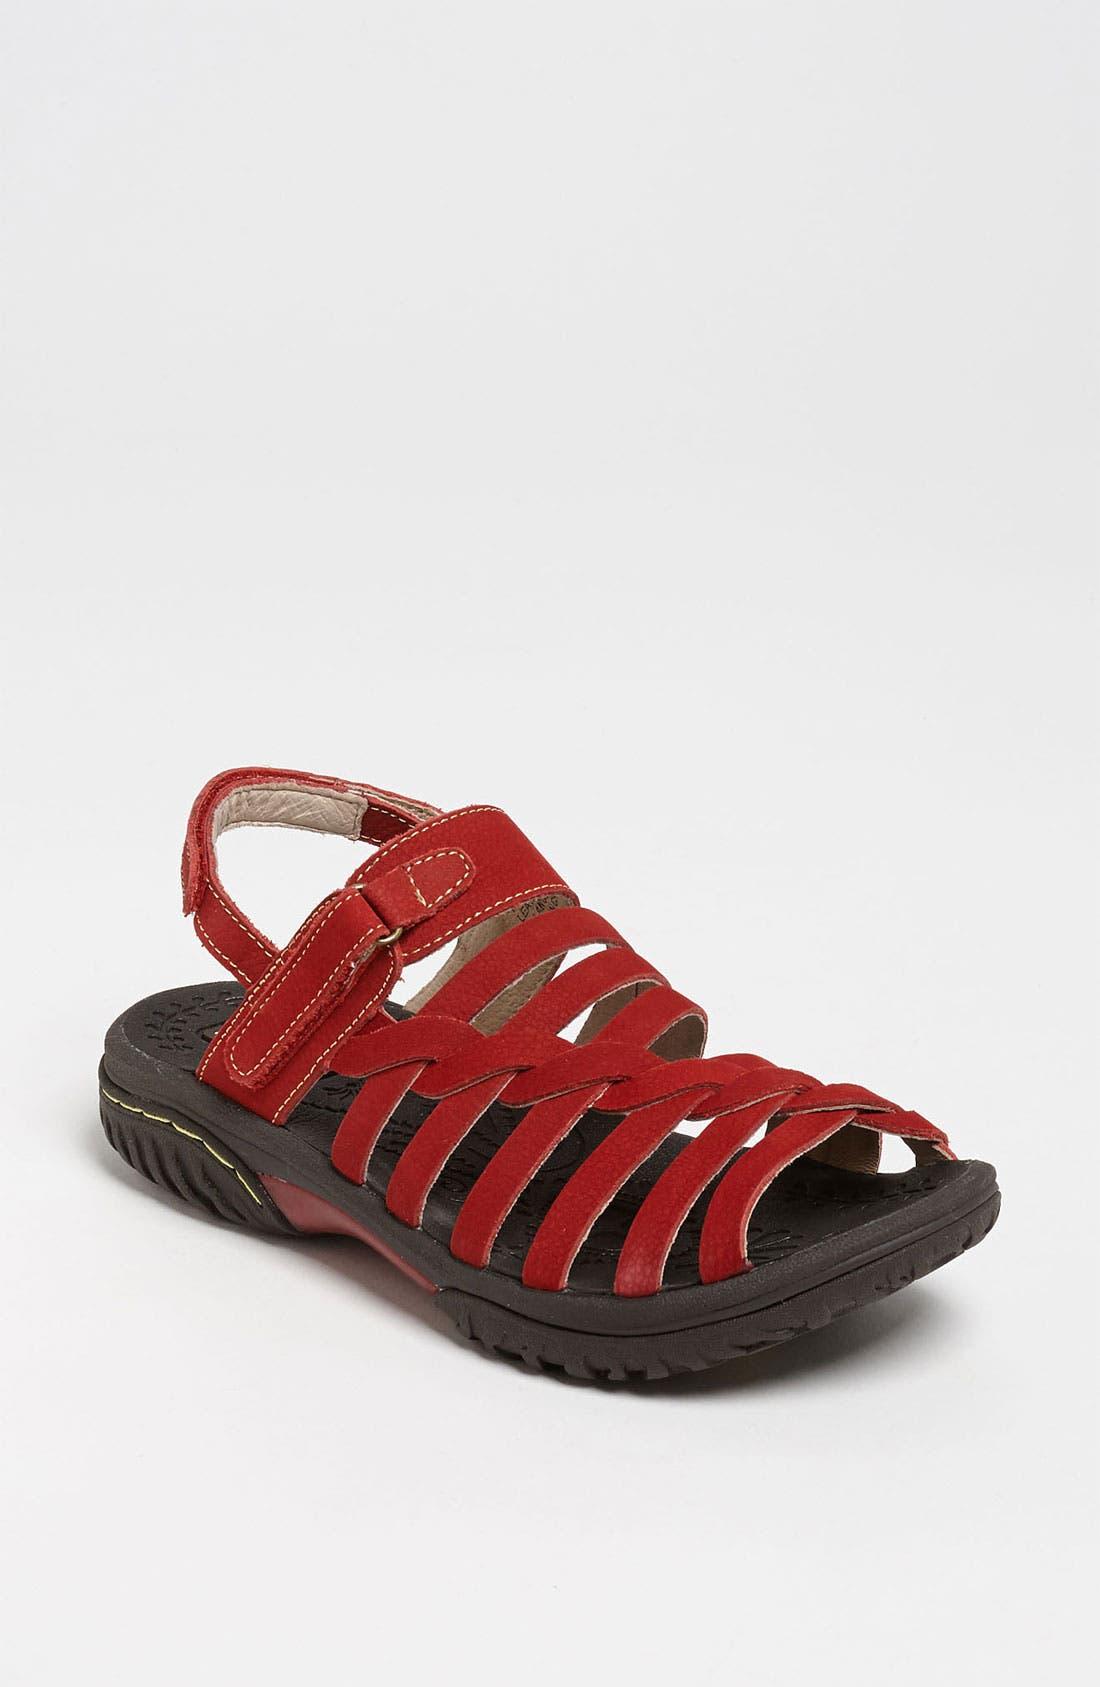 Alternate Image 1 Selected - Jambu 'Holly' Sandal